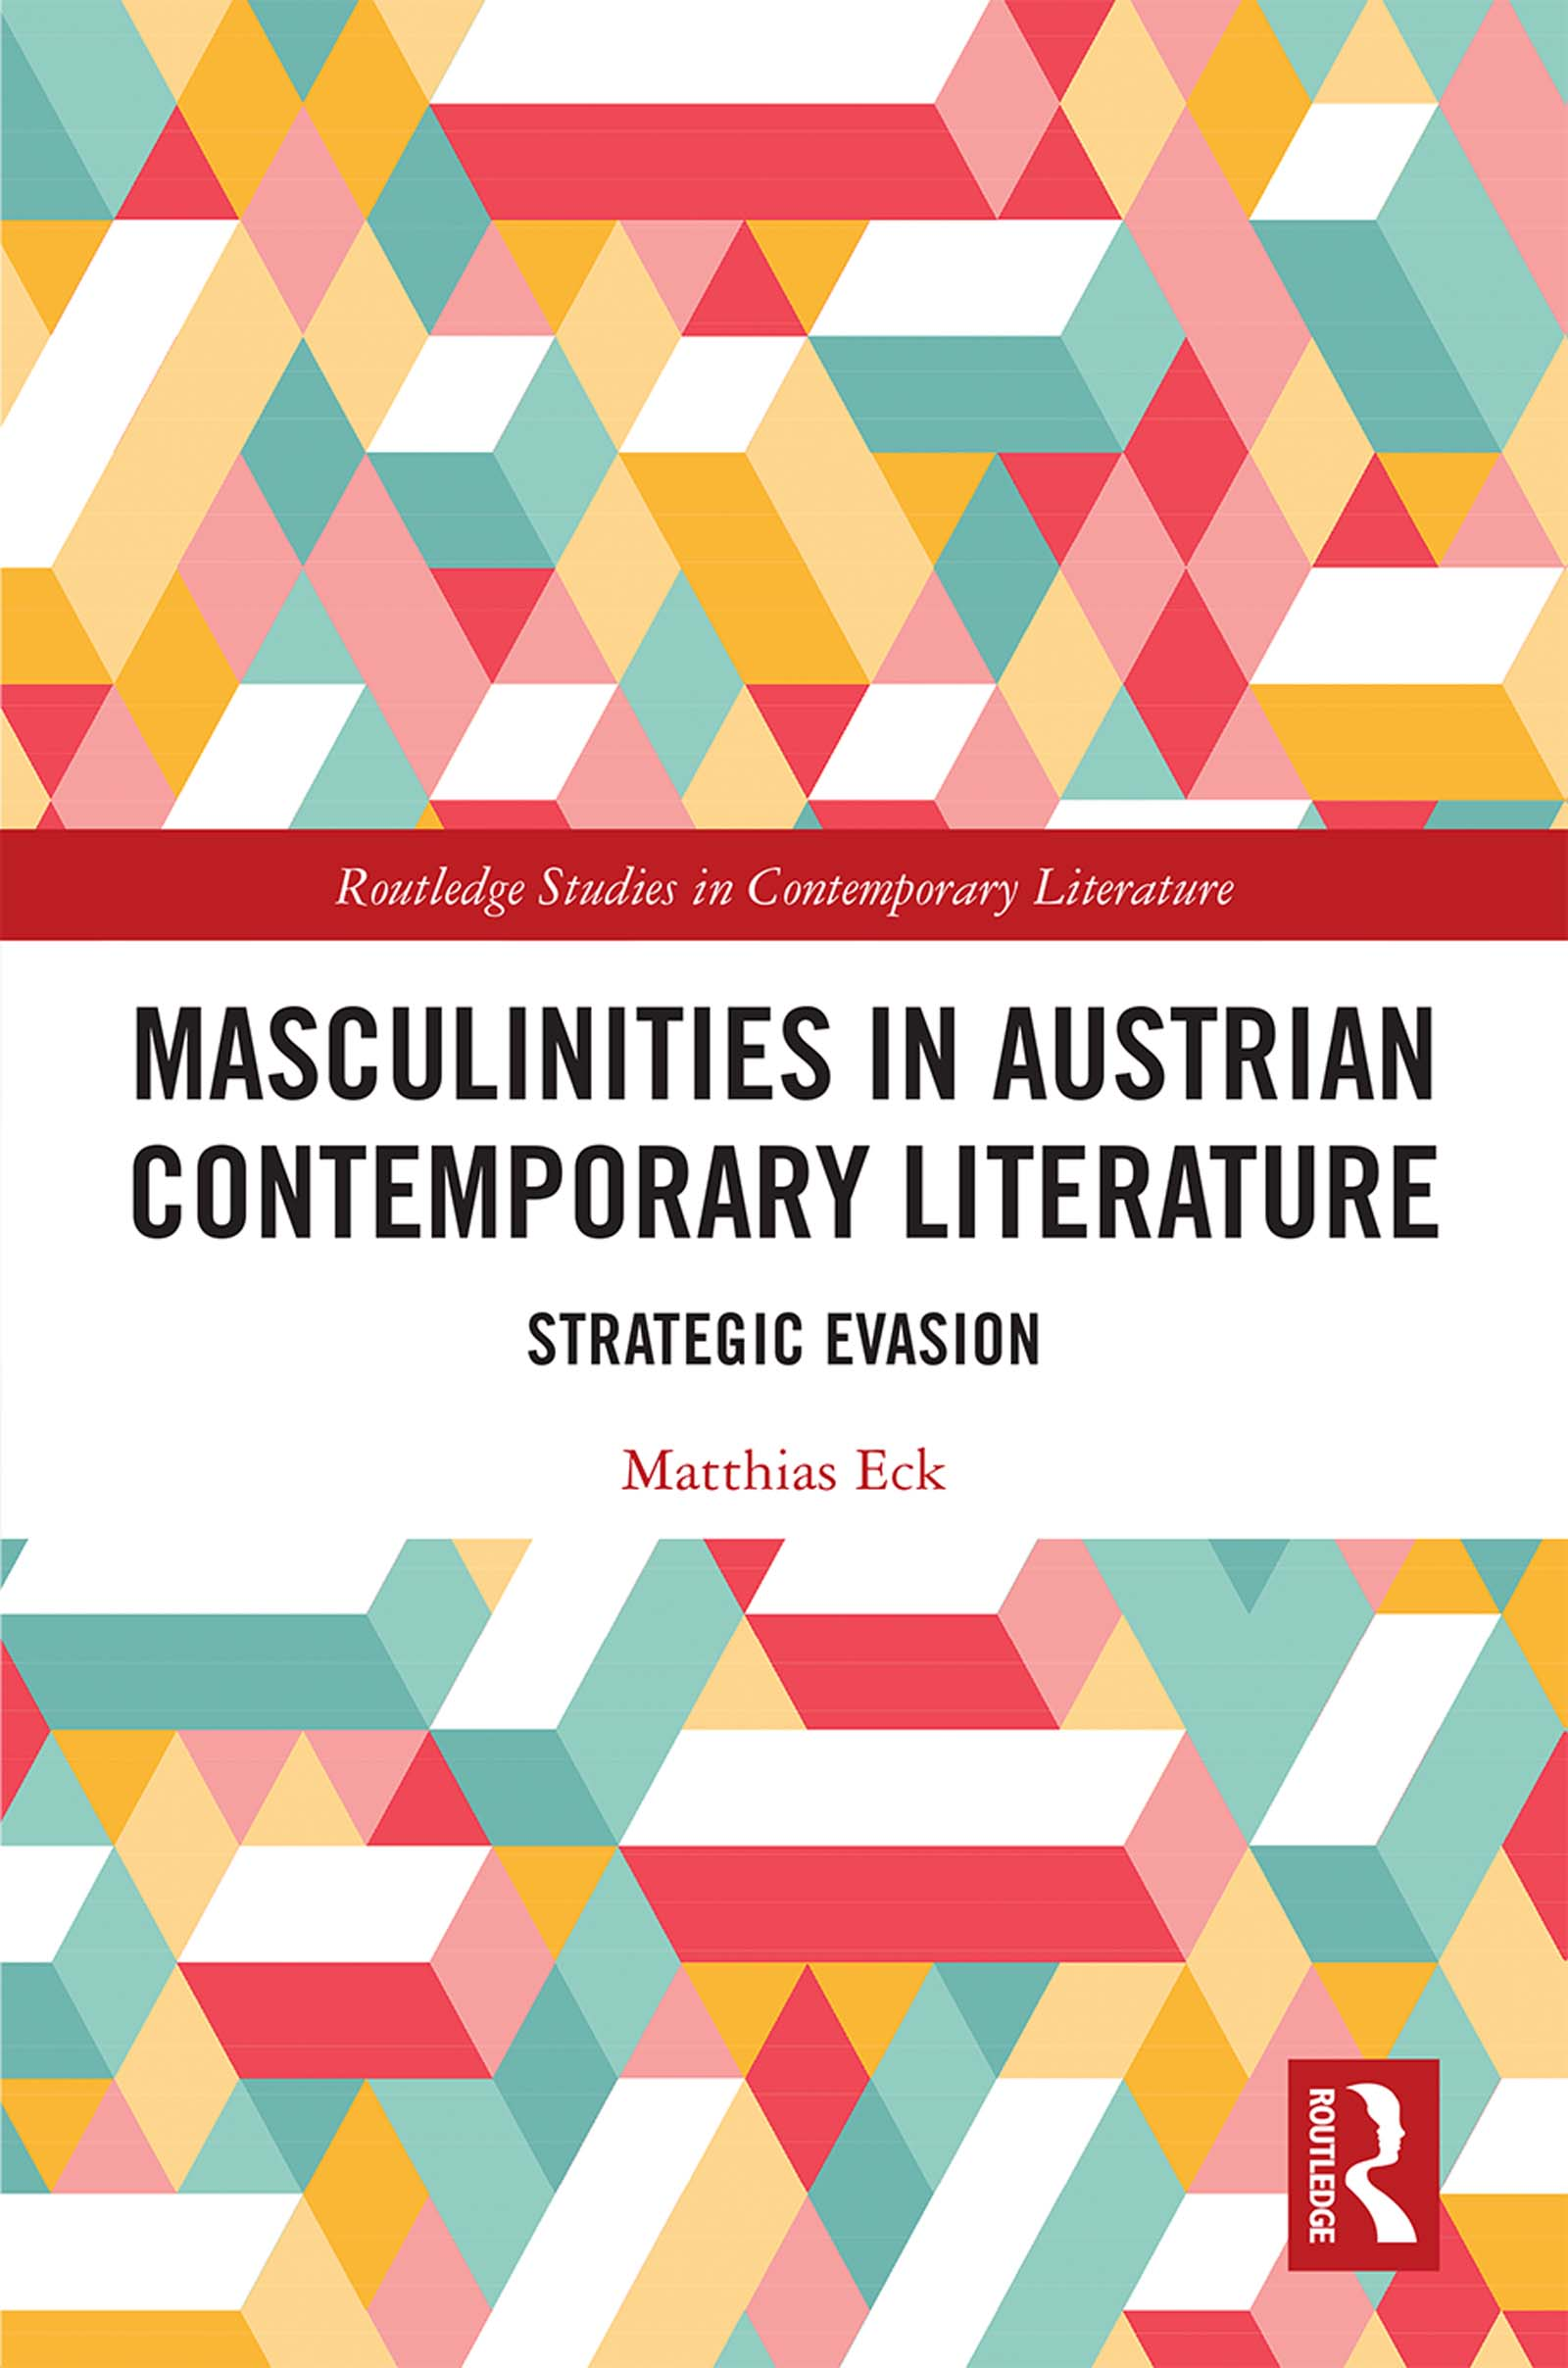 Masculinities in Austrian Contemporary Literature